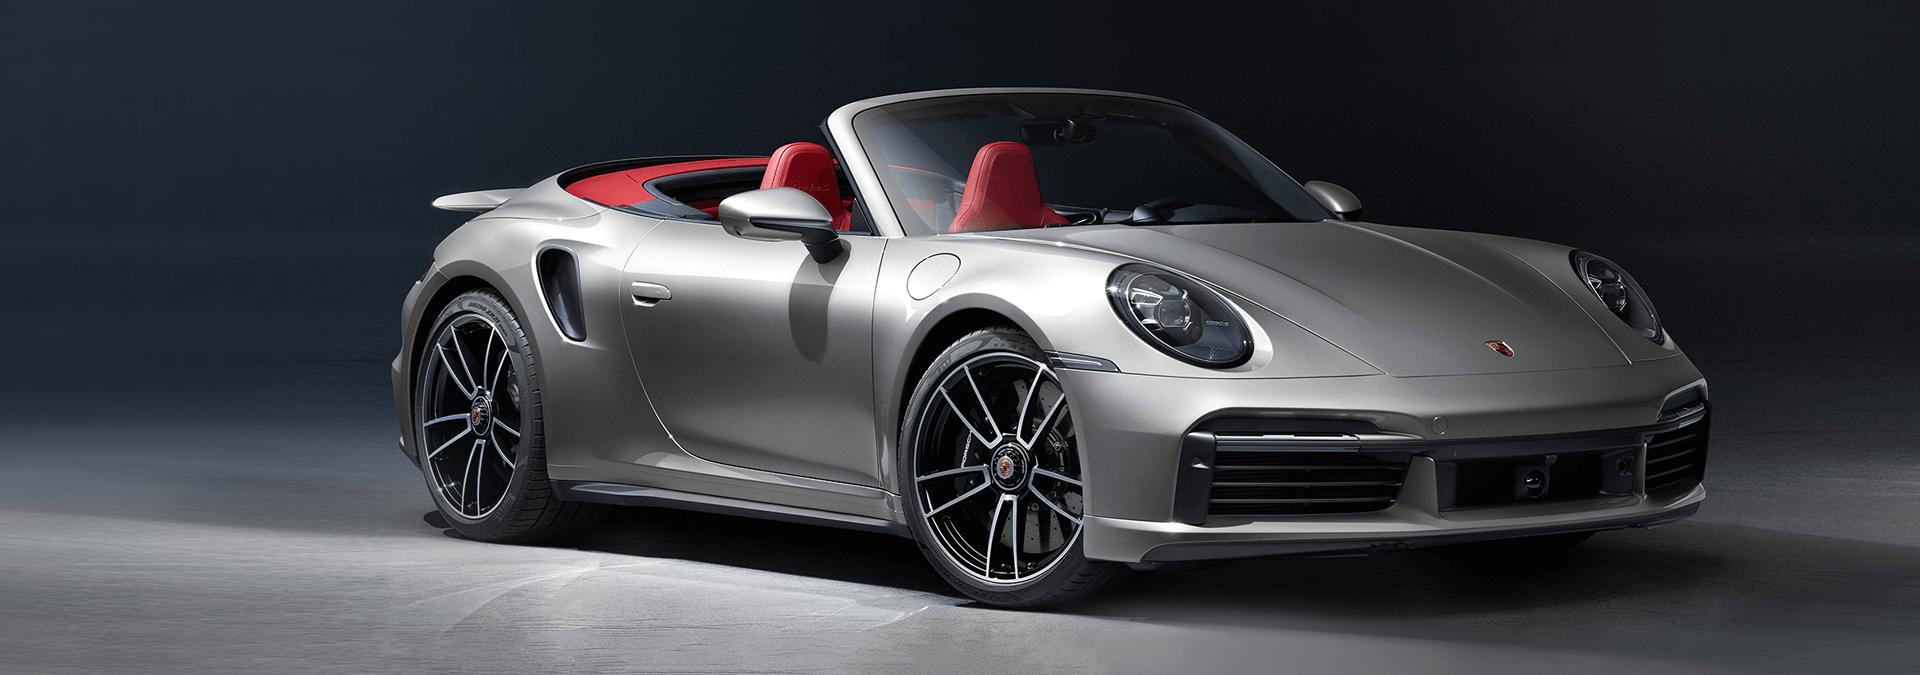 Used Porsche car image